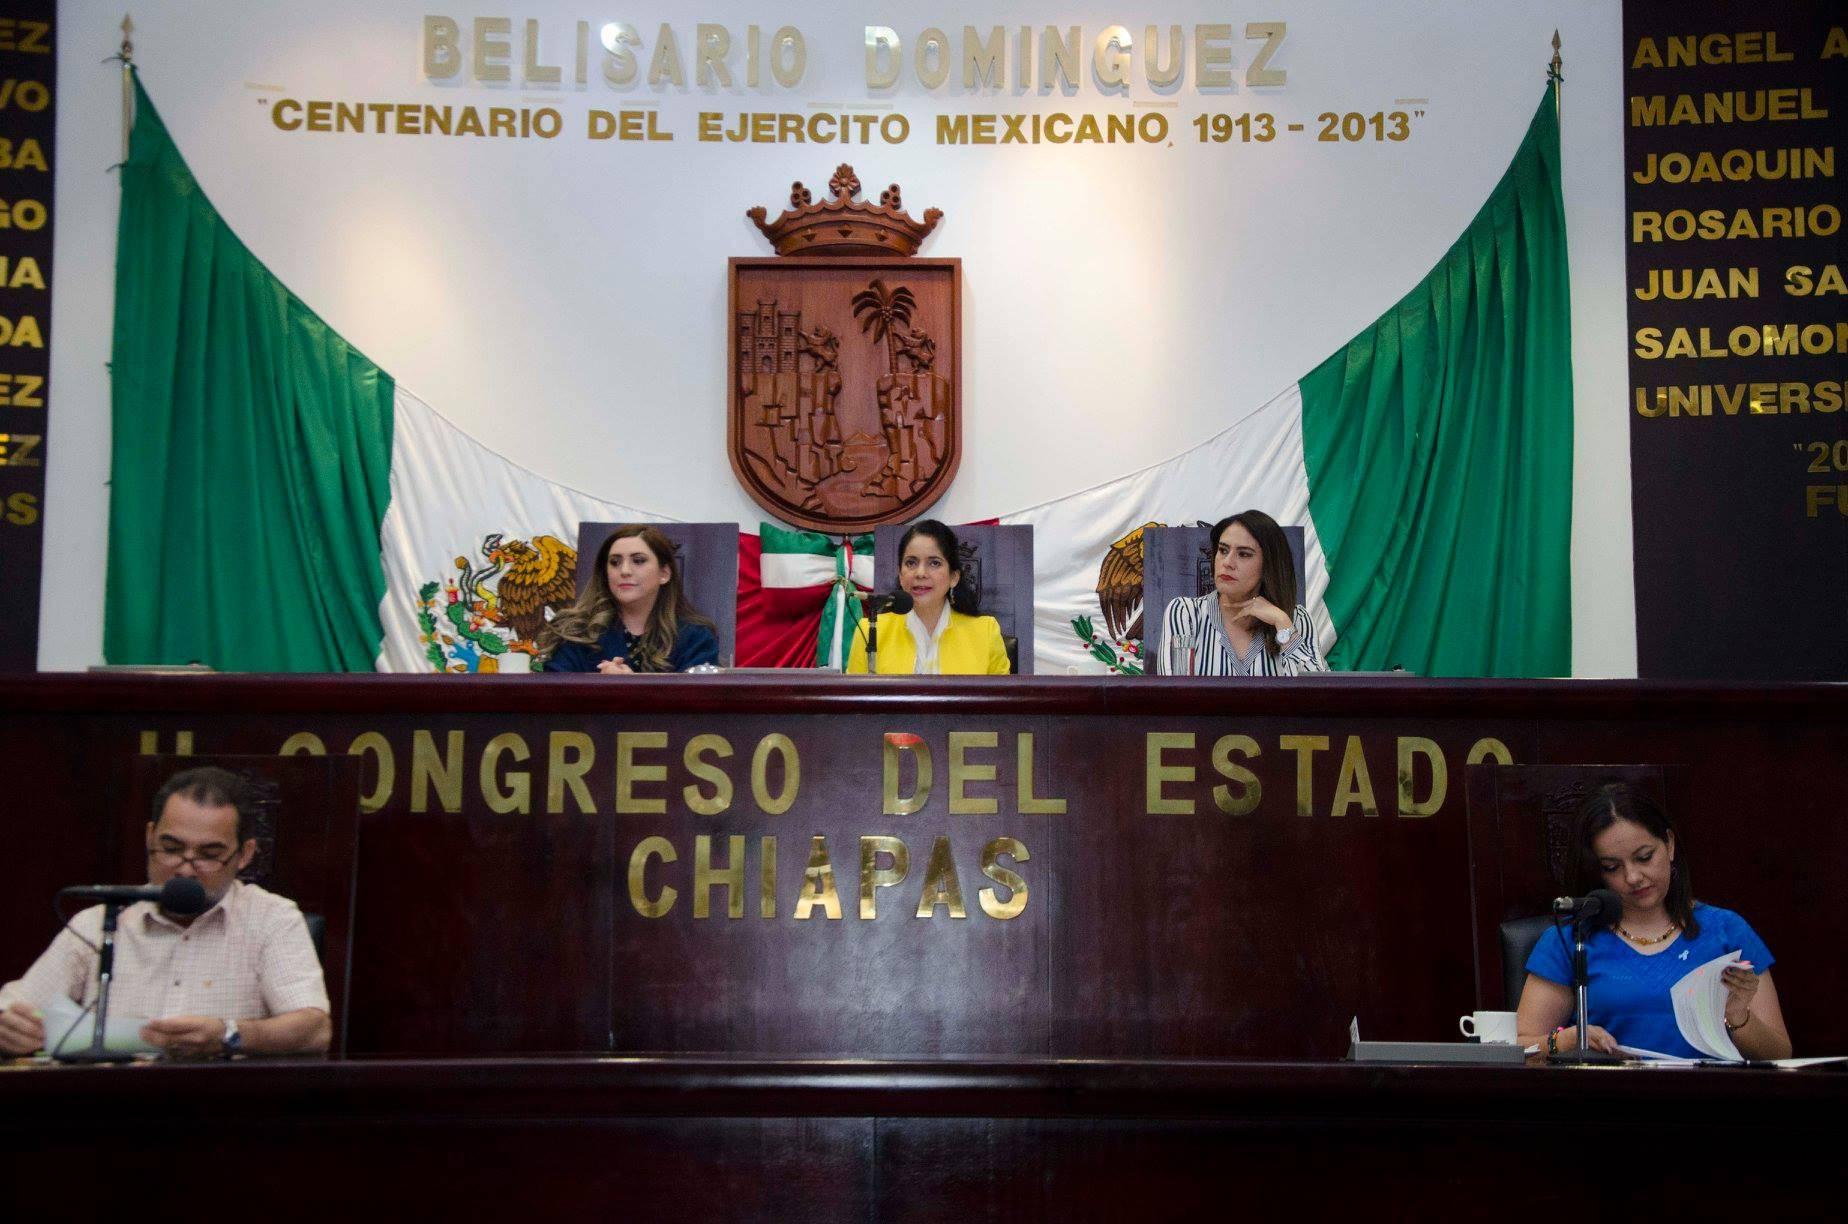 Chiapas ciber acoso